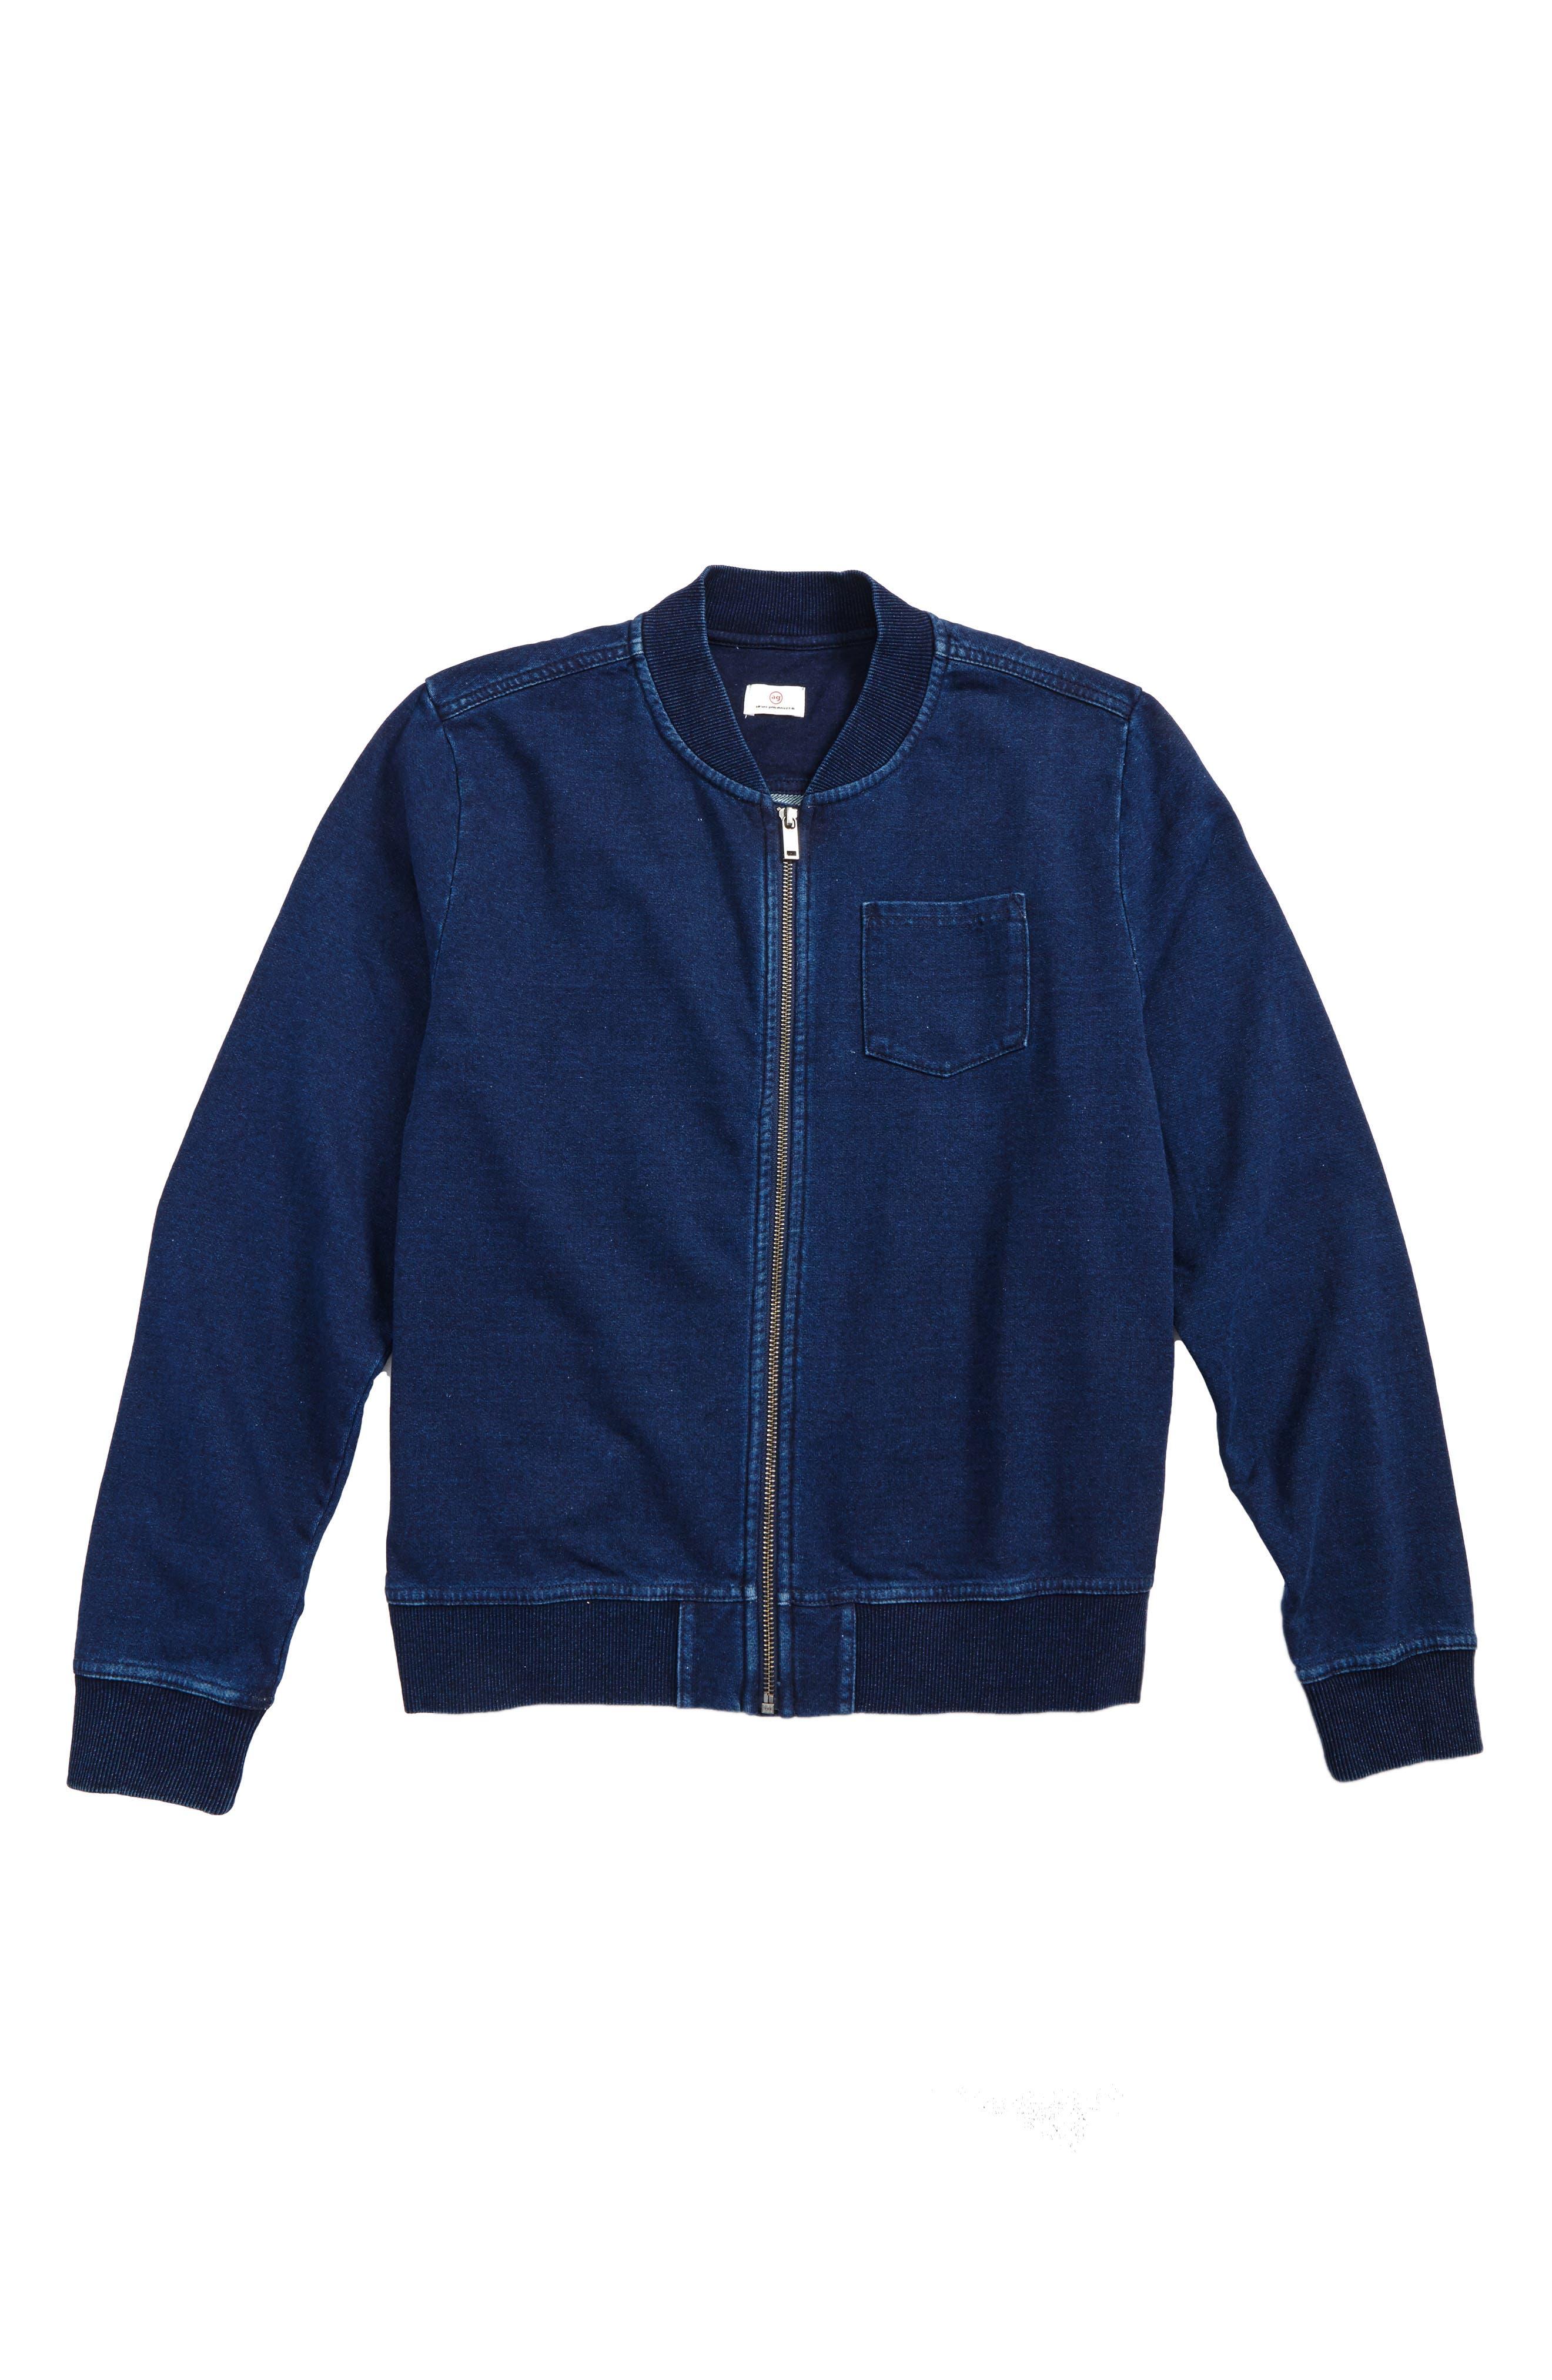 Main Image - AG Jersey Fleece Bomber Jacket (Little Boys & Big Boys)